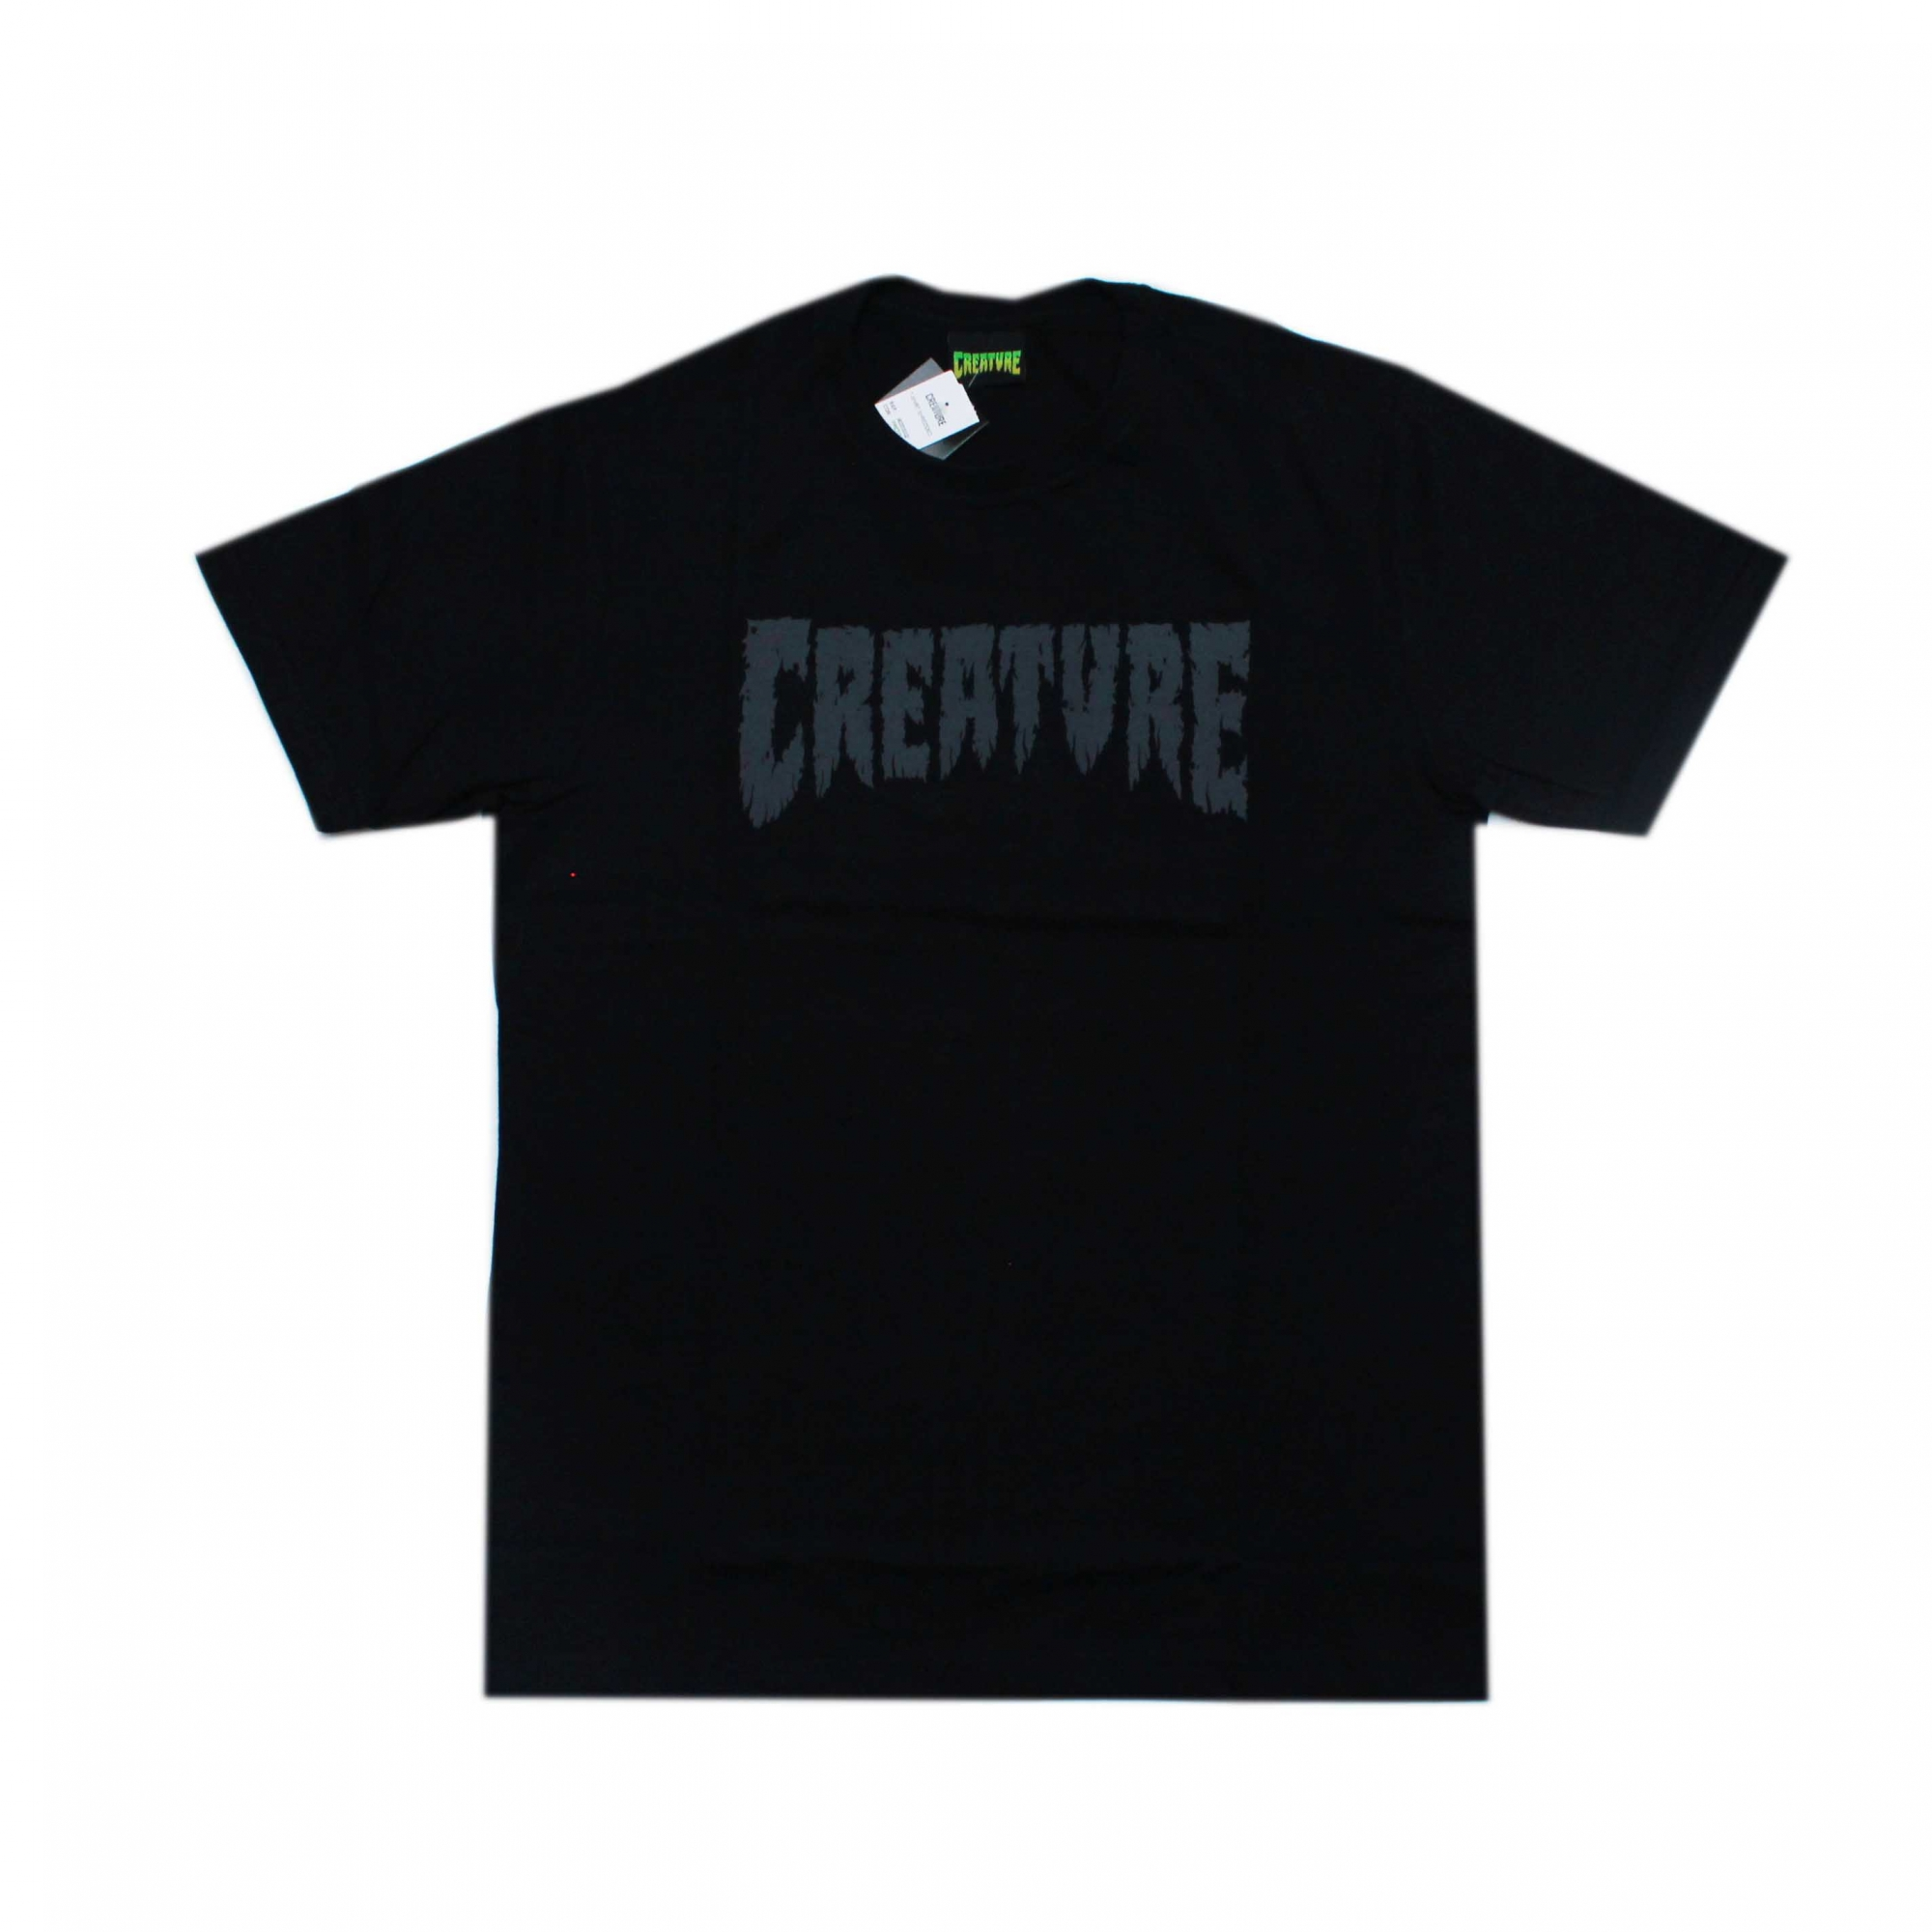 Camiseta Creature Shredded - Preto